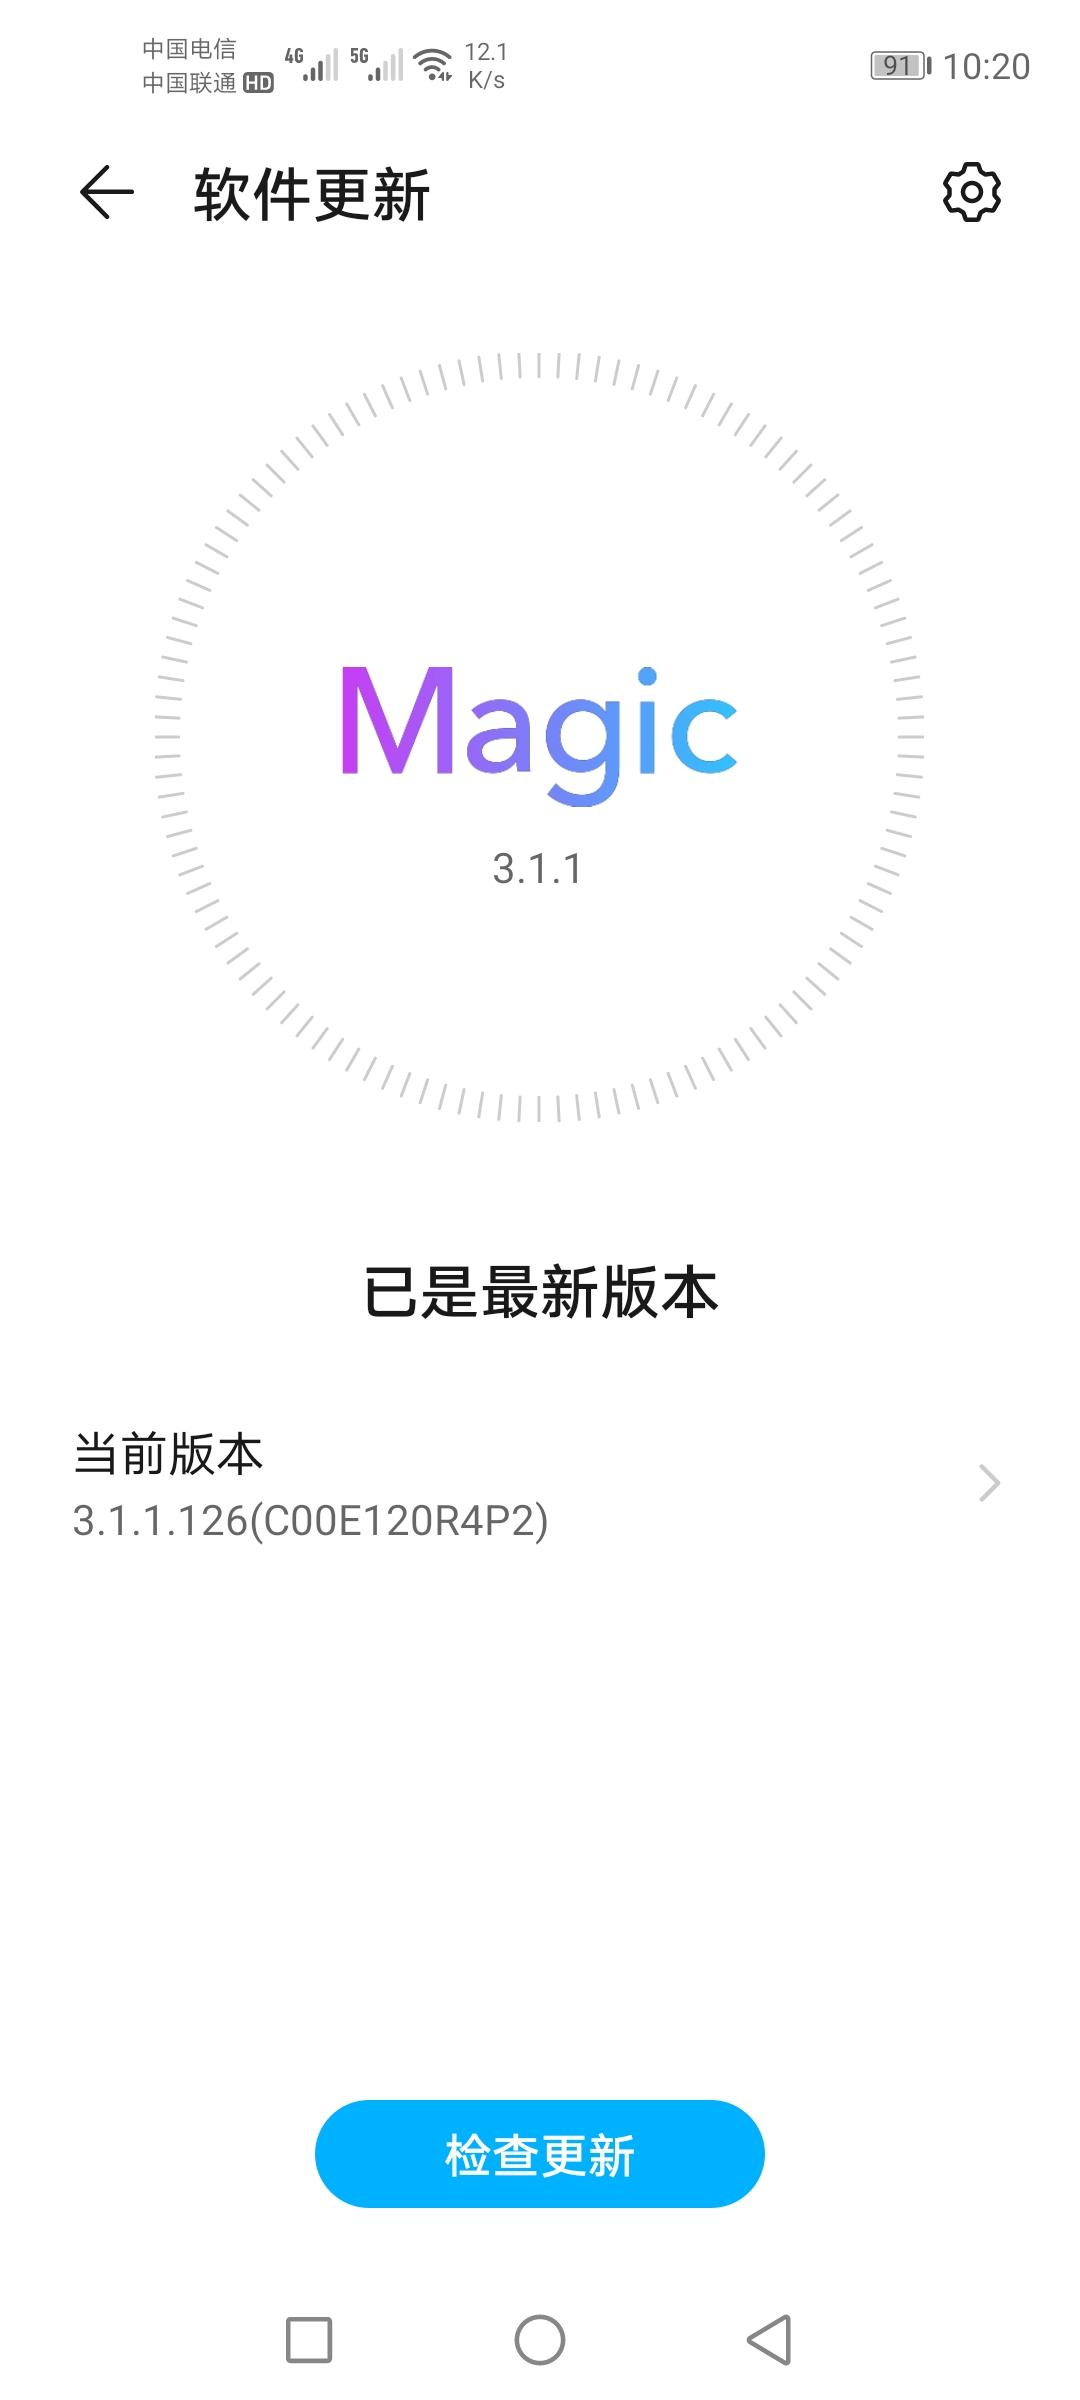 Screenshot_20200510_102044_com.huawei.android.hwouc.jpg